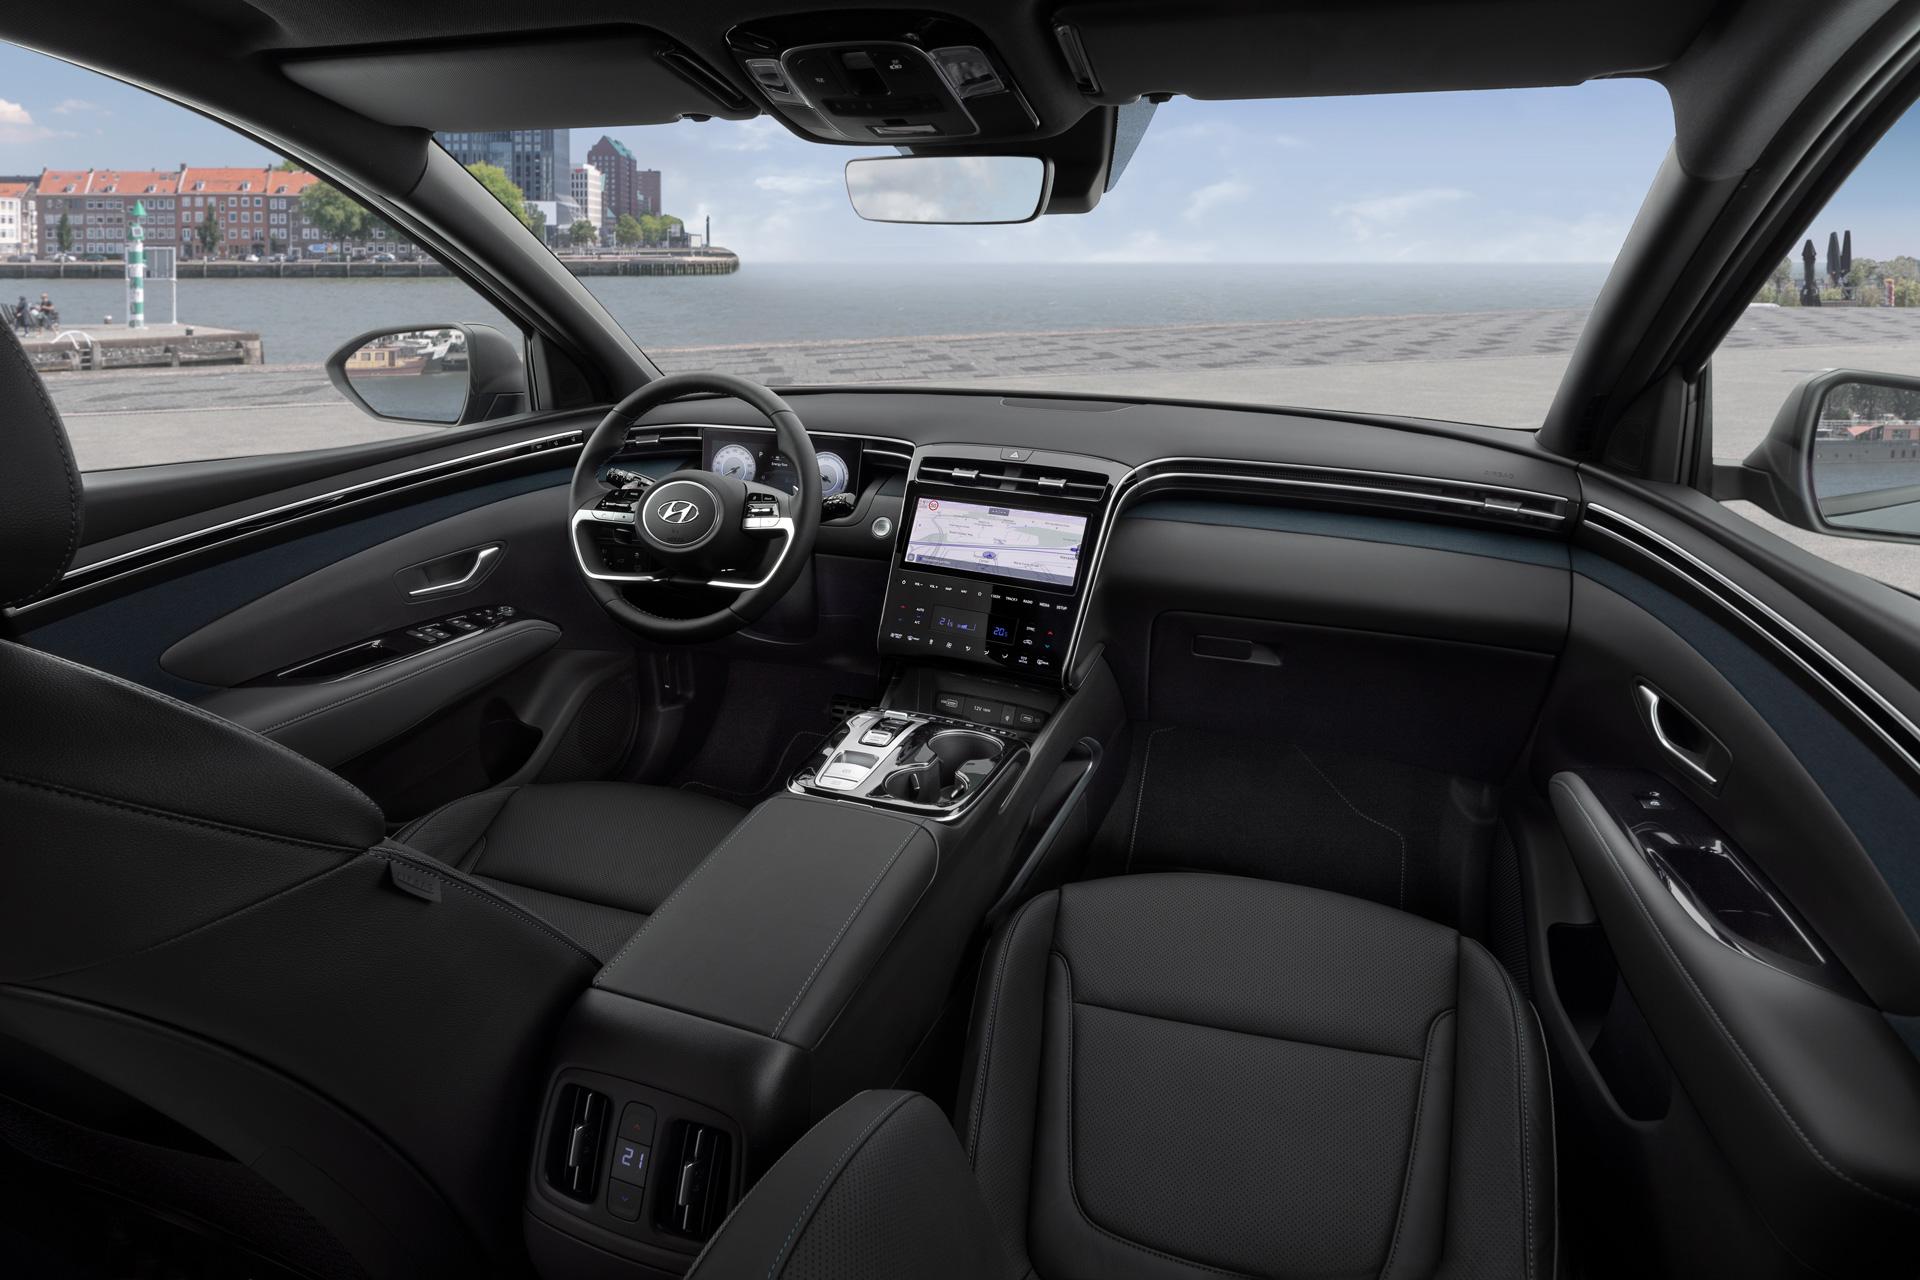 Ny Hyundai Tucson interiør